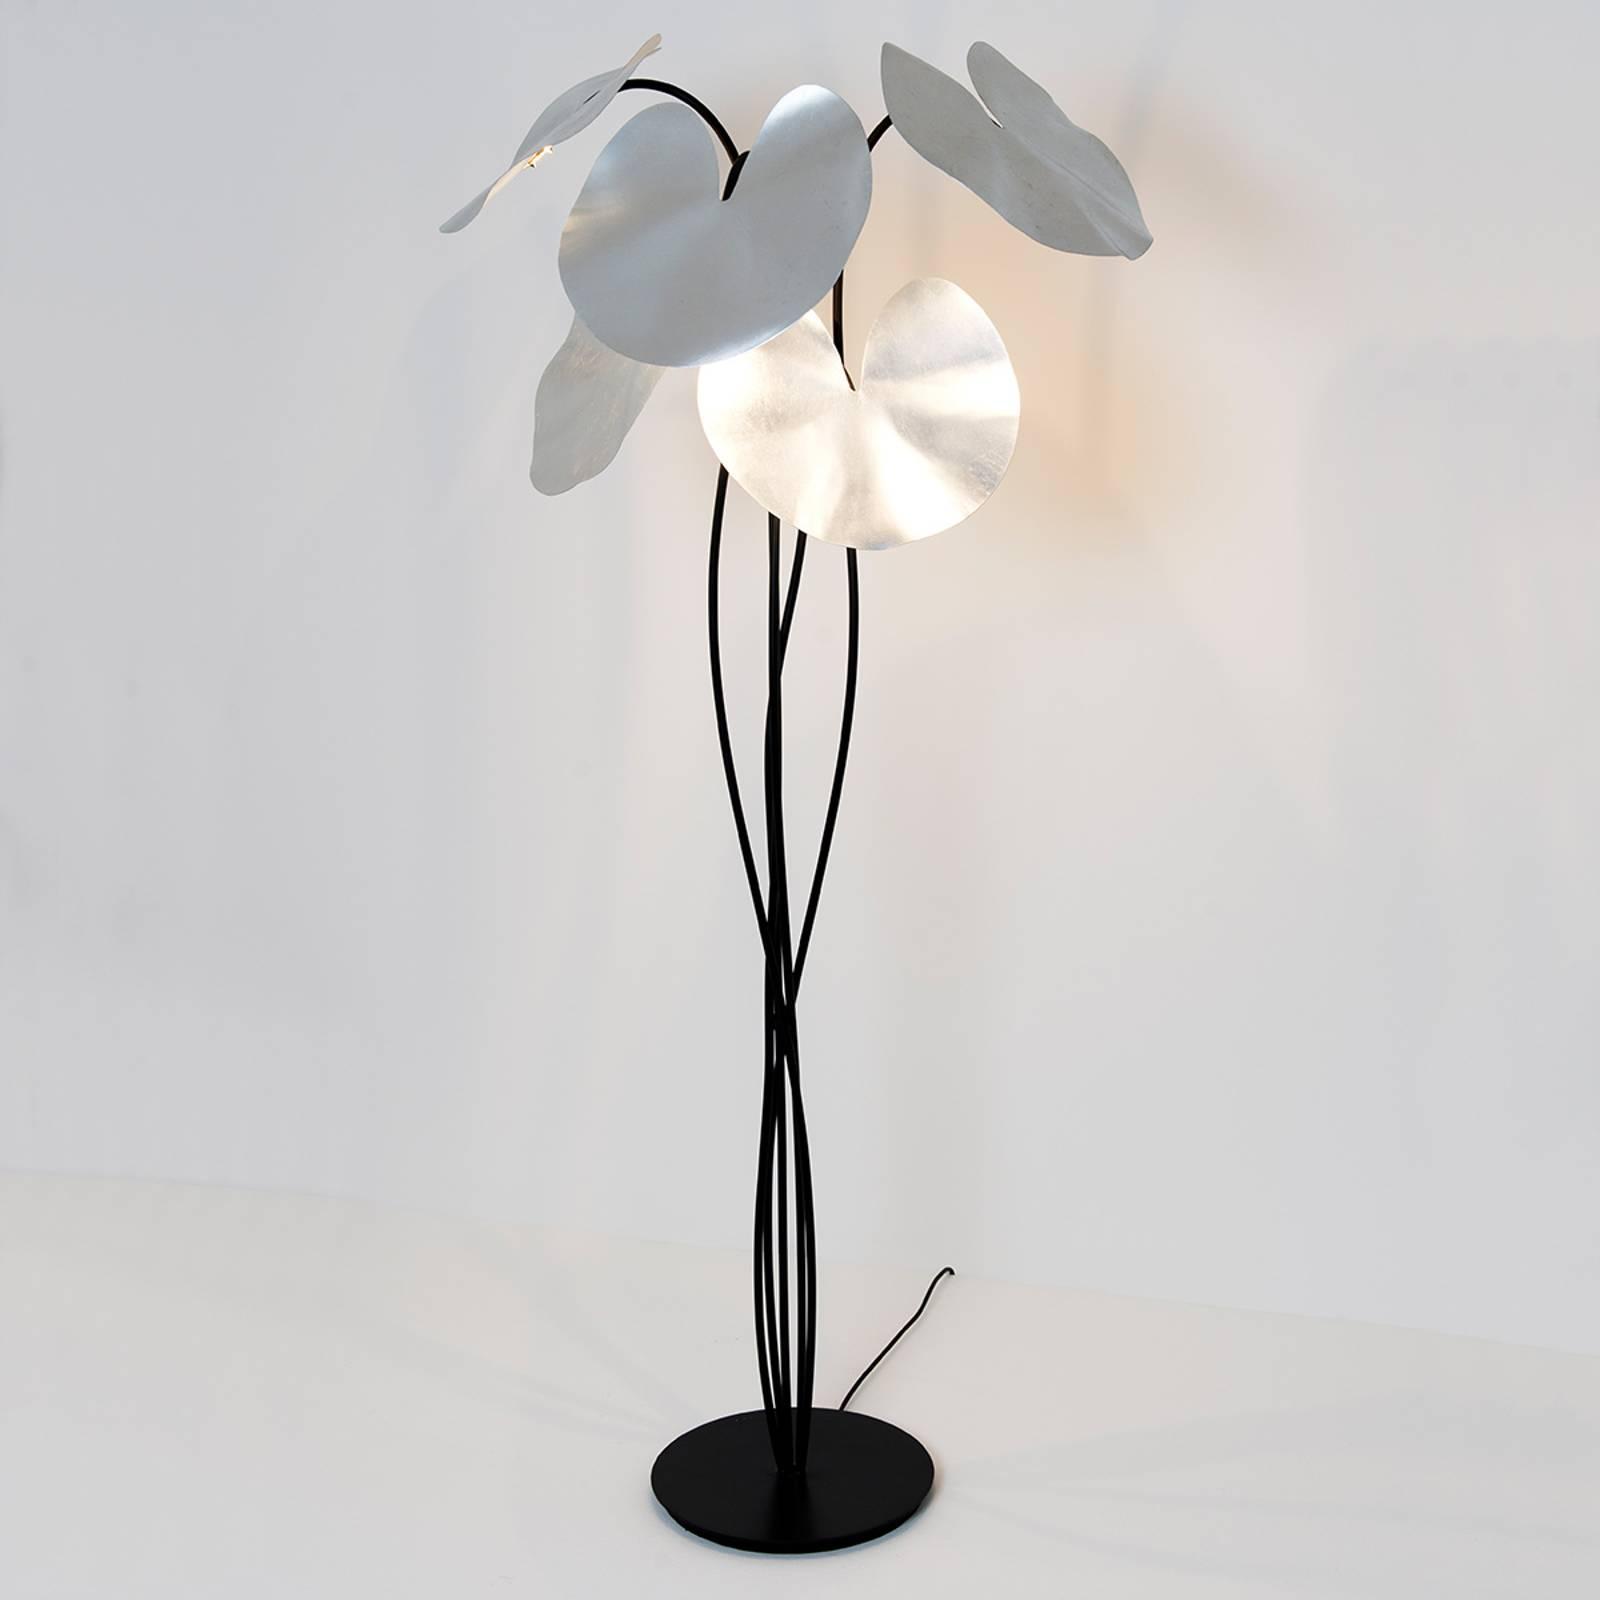 LED-lattiavalo Controversia, hopeinen varjostin